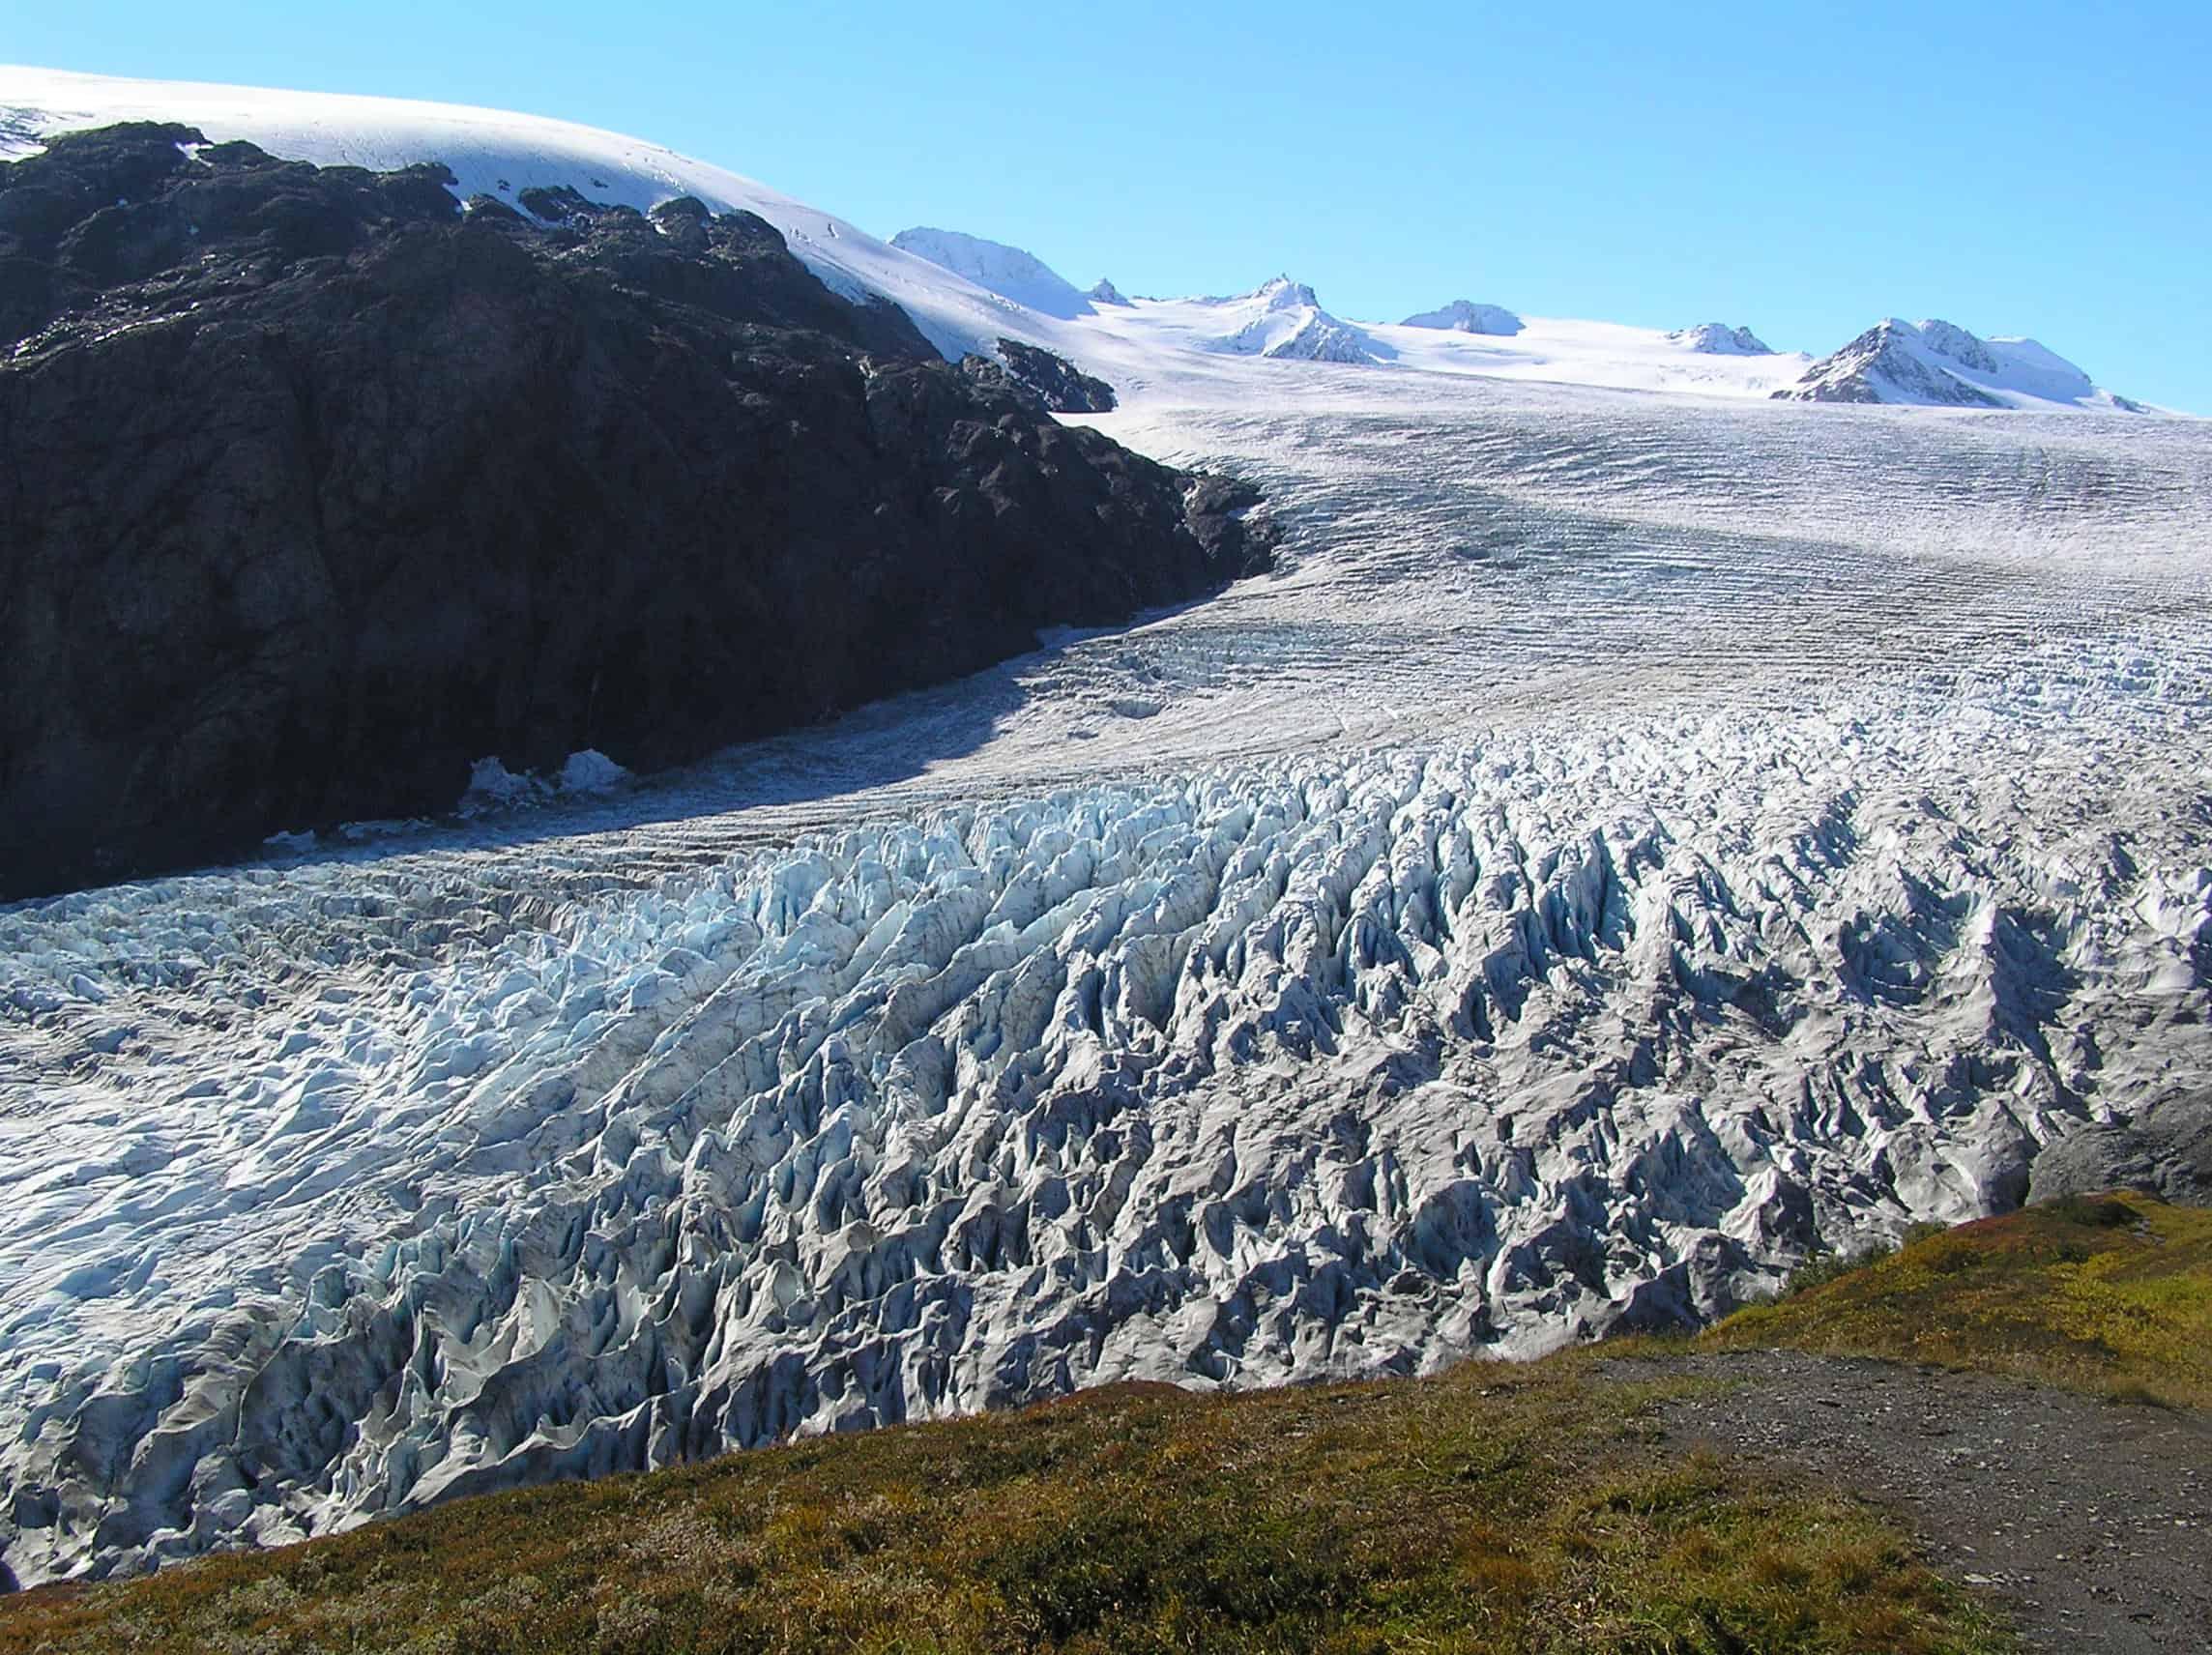 Exit Glacier Kenai Fjords National Park